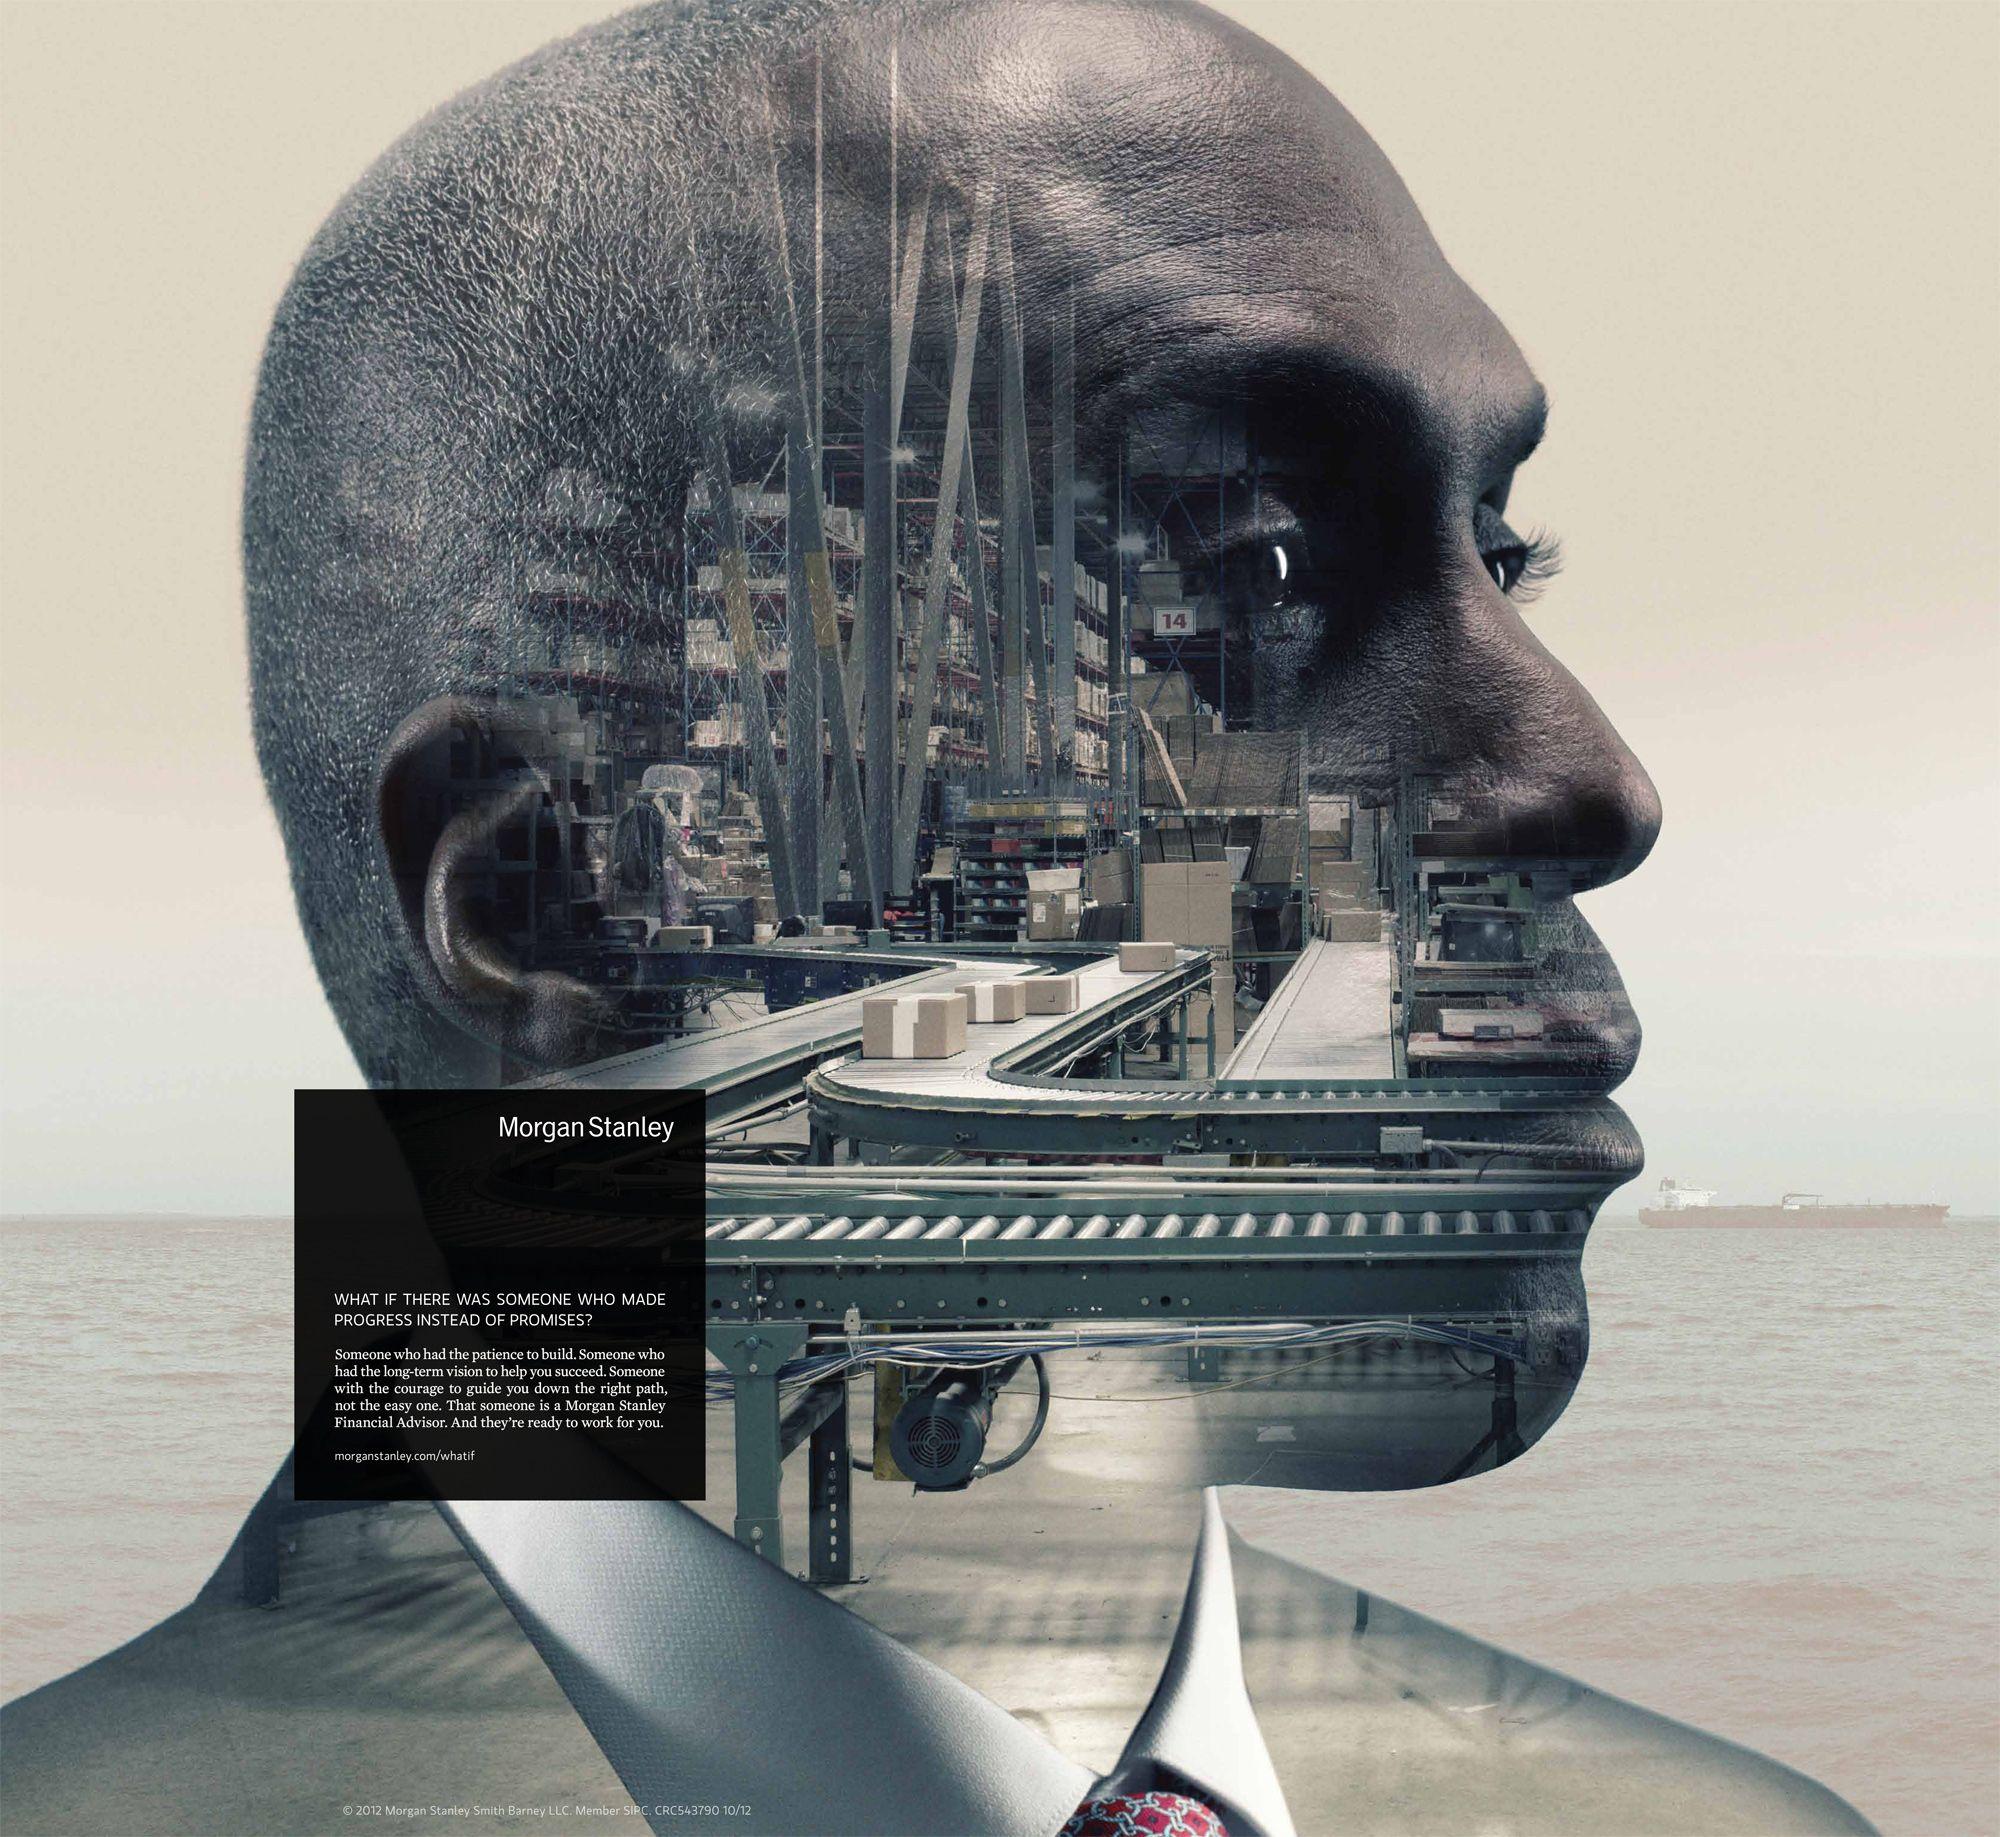 Morgan Stanley: African American Man